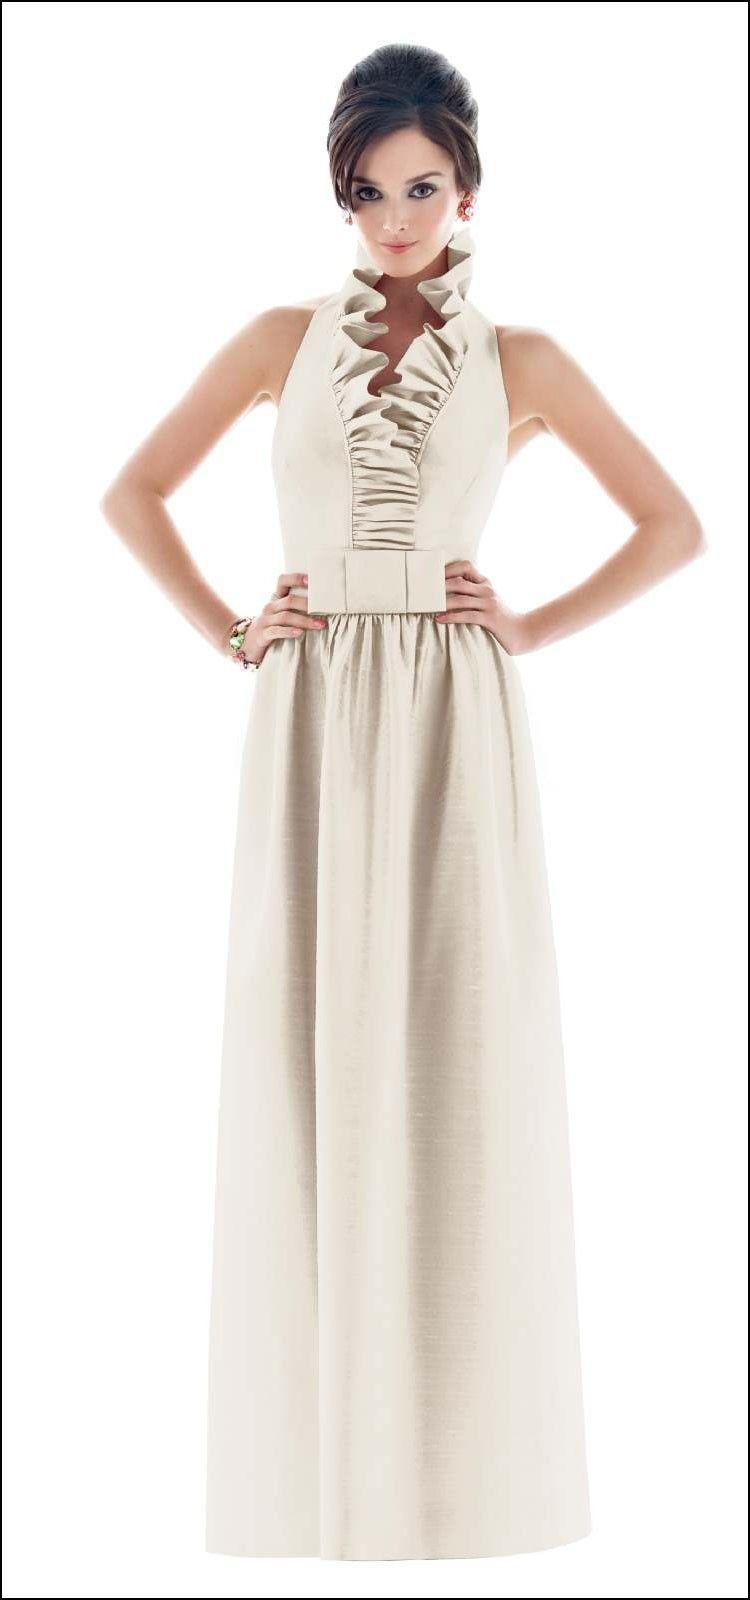 Ruffle collar bridesmaid dress dresses and gowns ideas ruffle collar bridesmaid dress ombrellifo Gallery